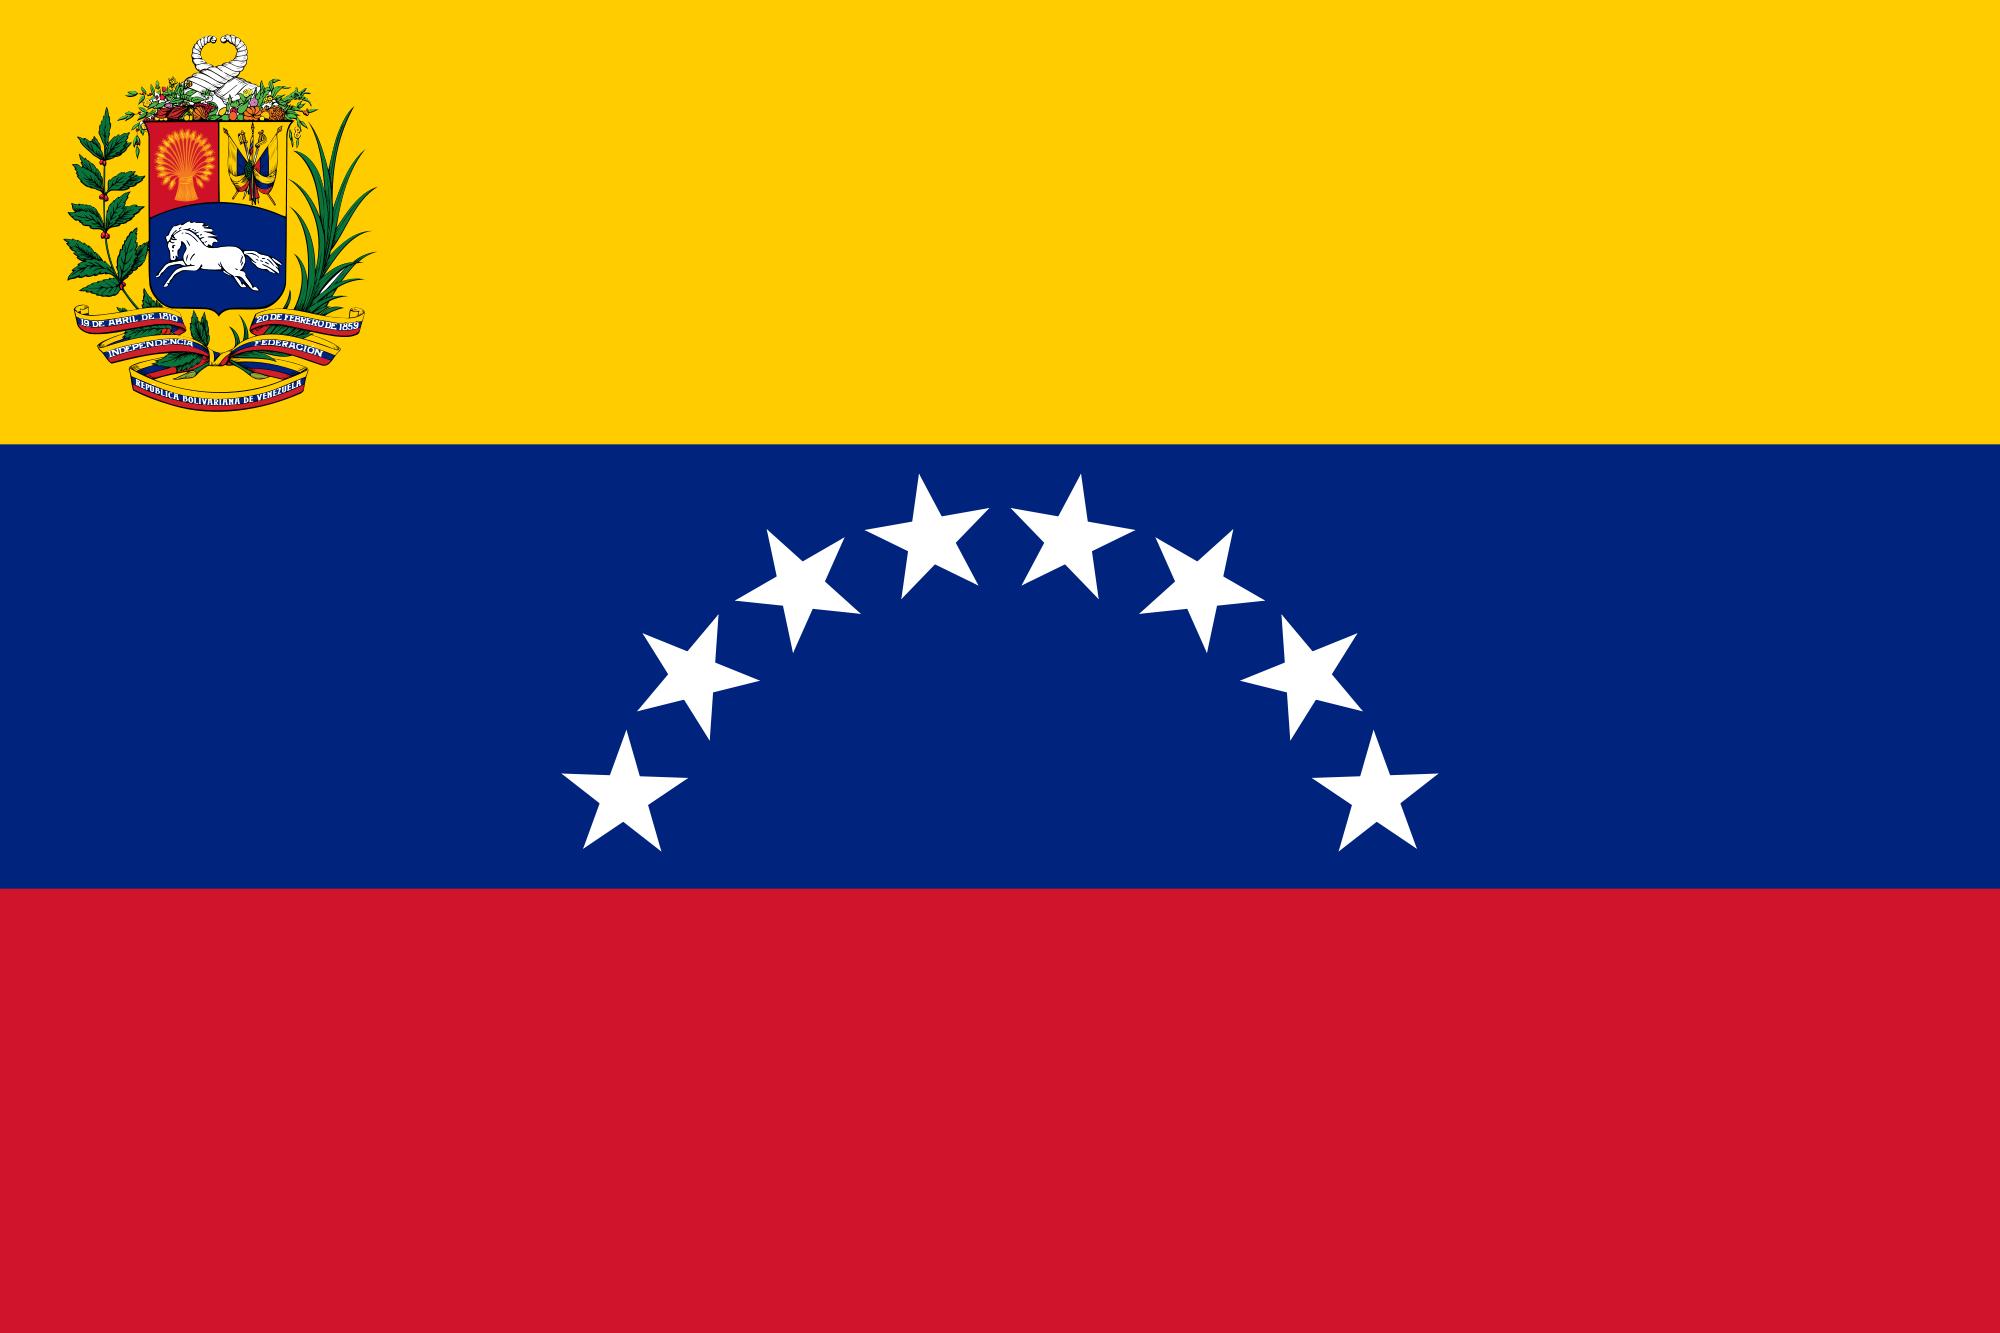 Venezuela (State flag)